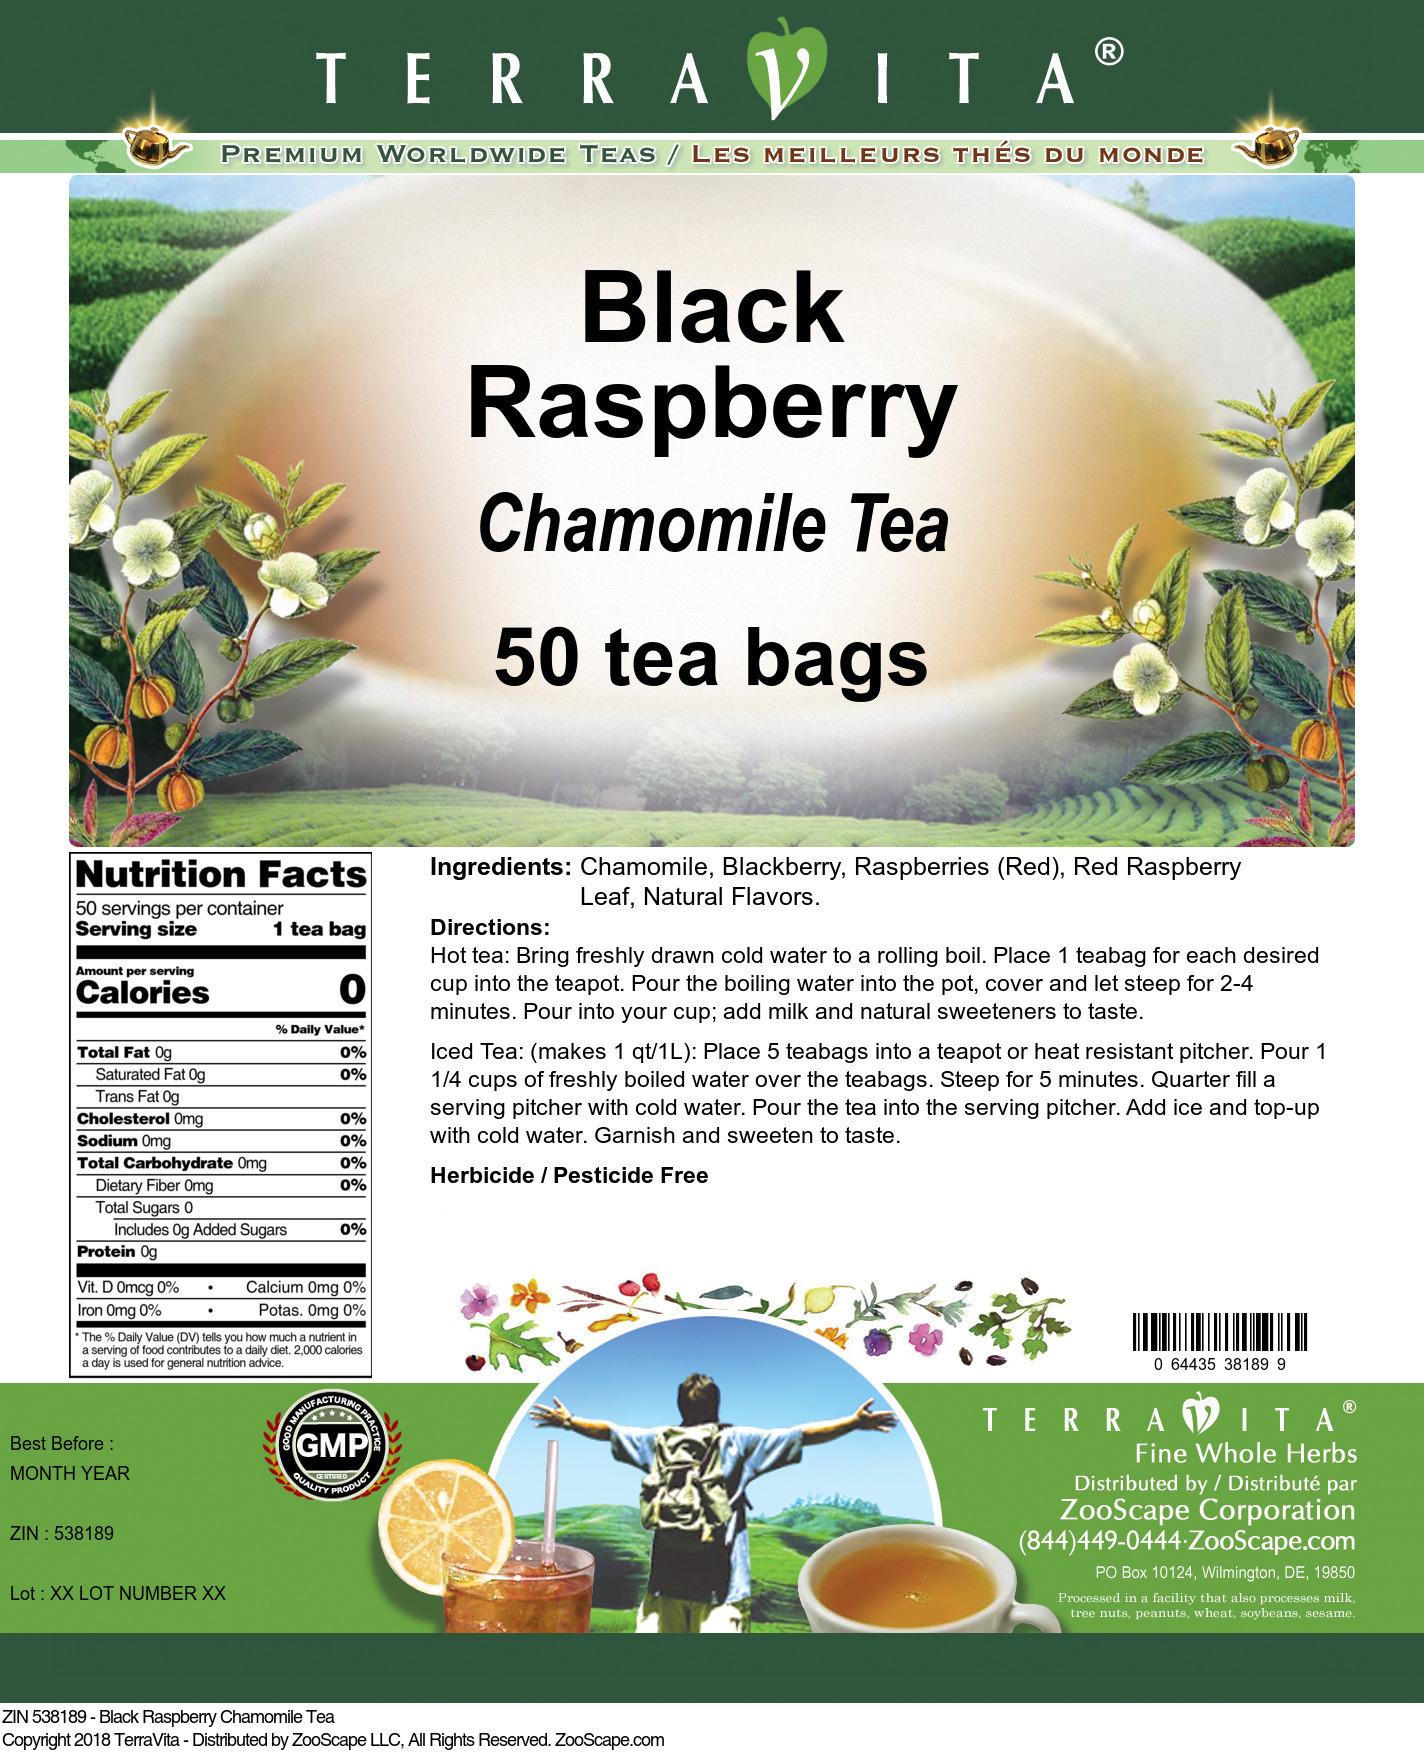 Black Raspberry Chamomile Tea